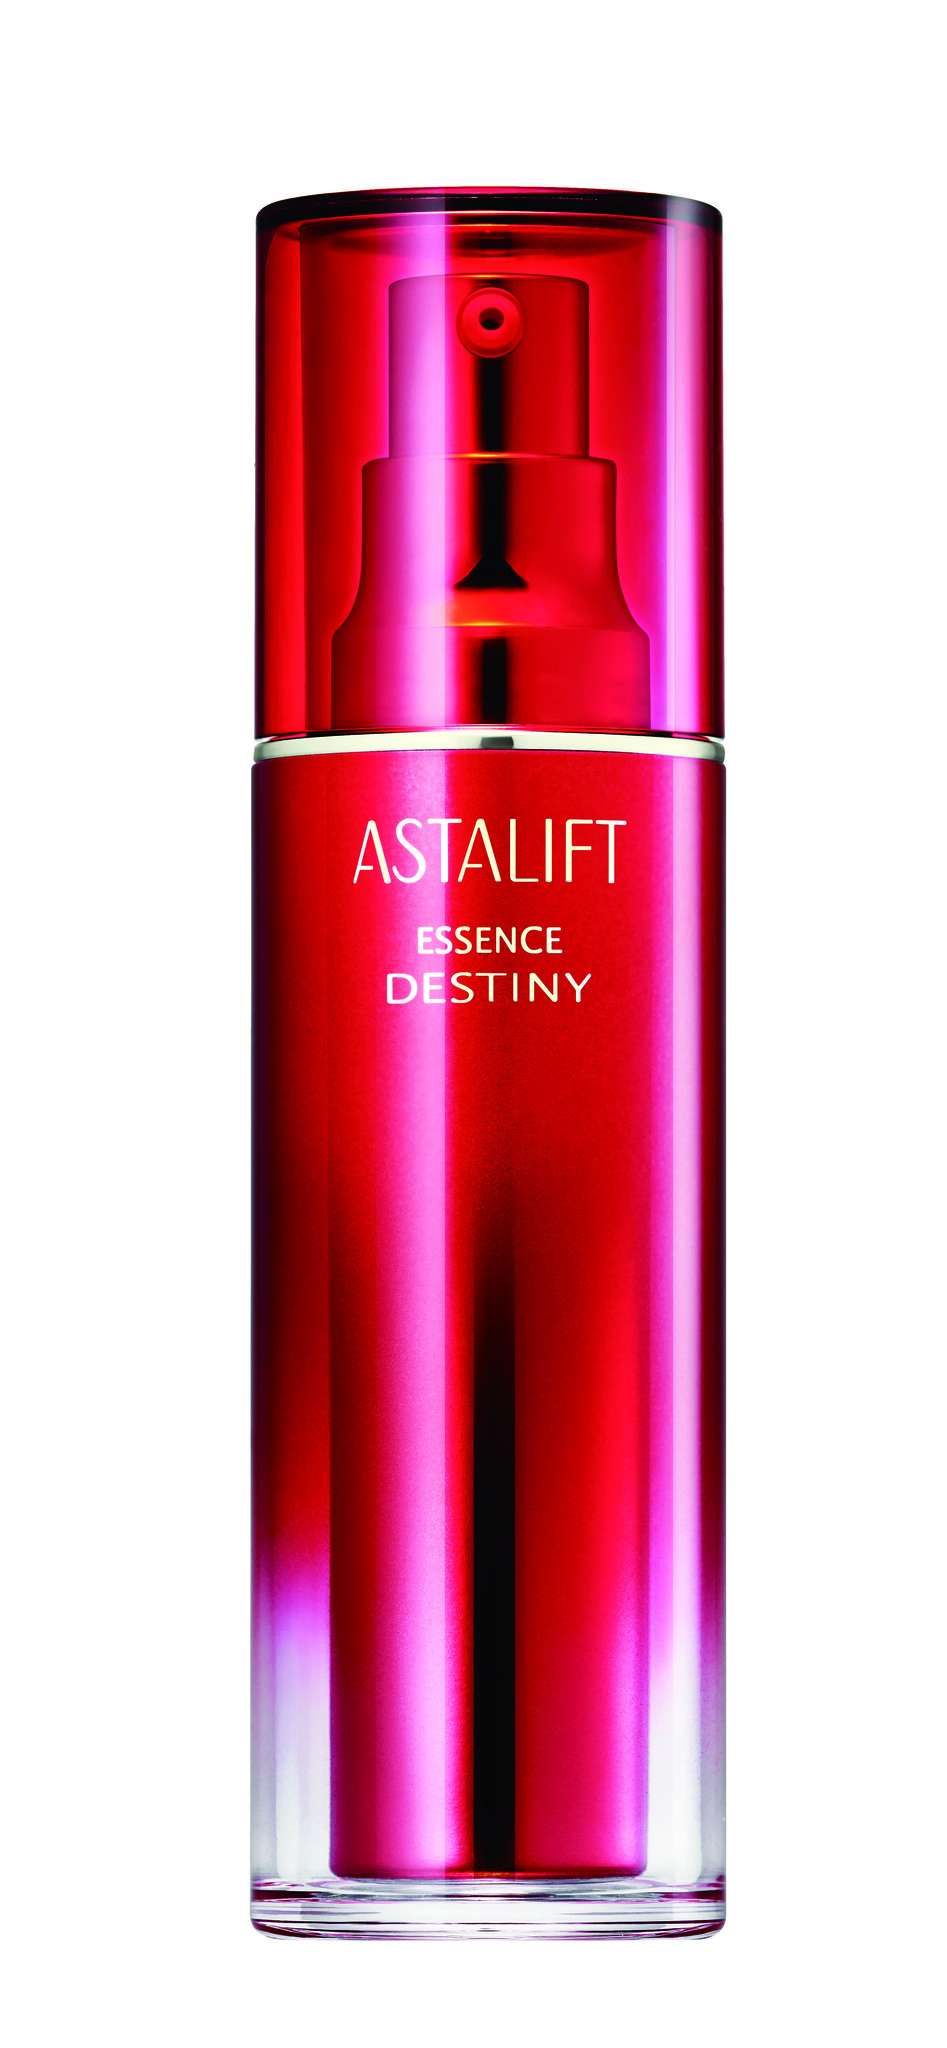 ASTALIFT Essence Destiny Эссенция для лица, 30 мл